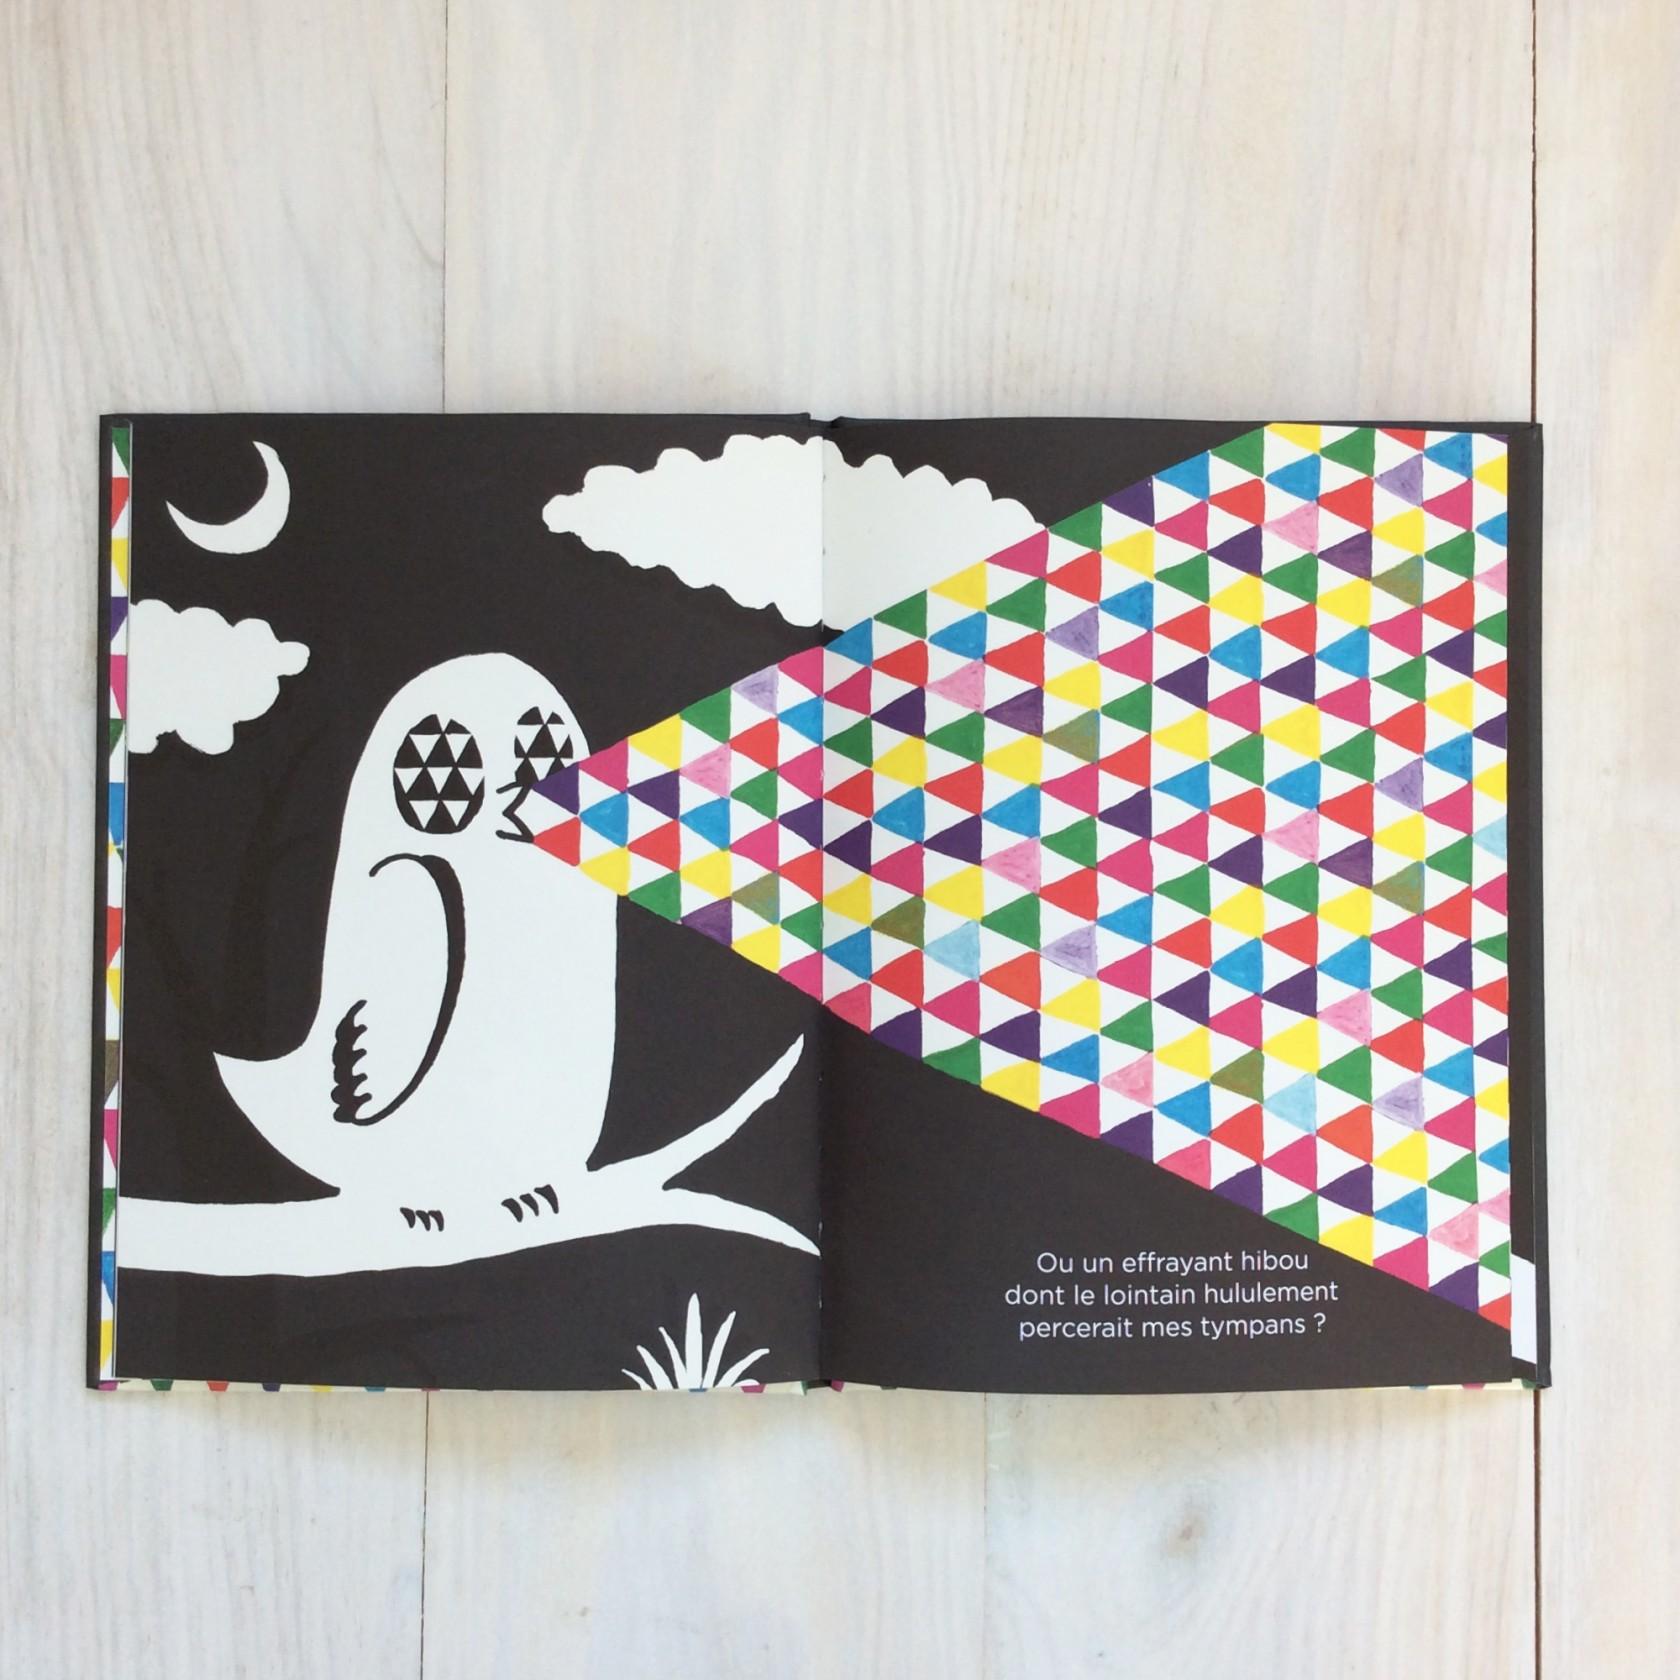 fouinzanardi -  fz_print.books_lesfourmsirouges11